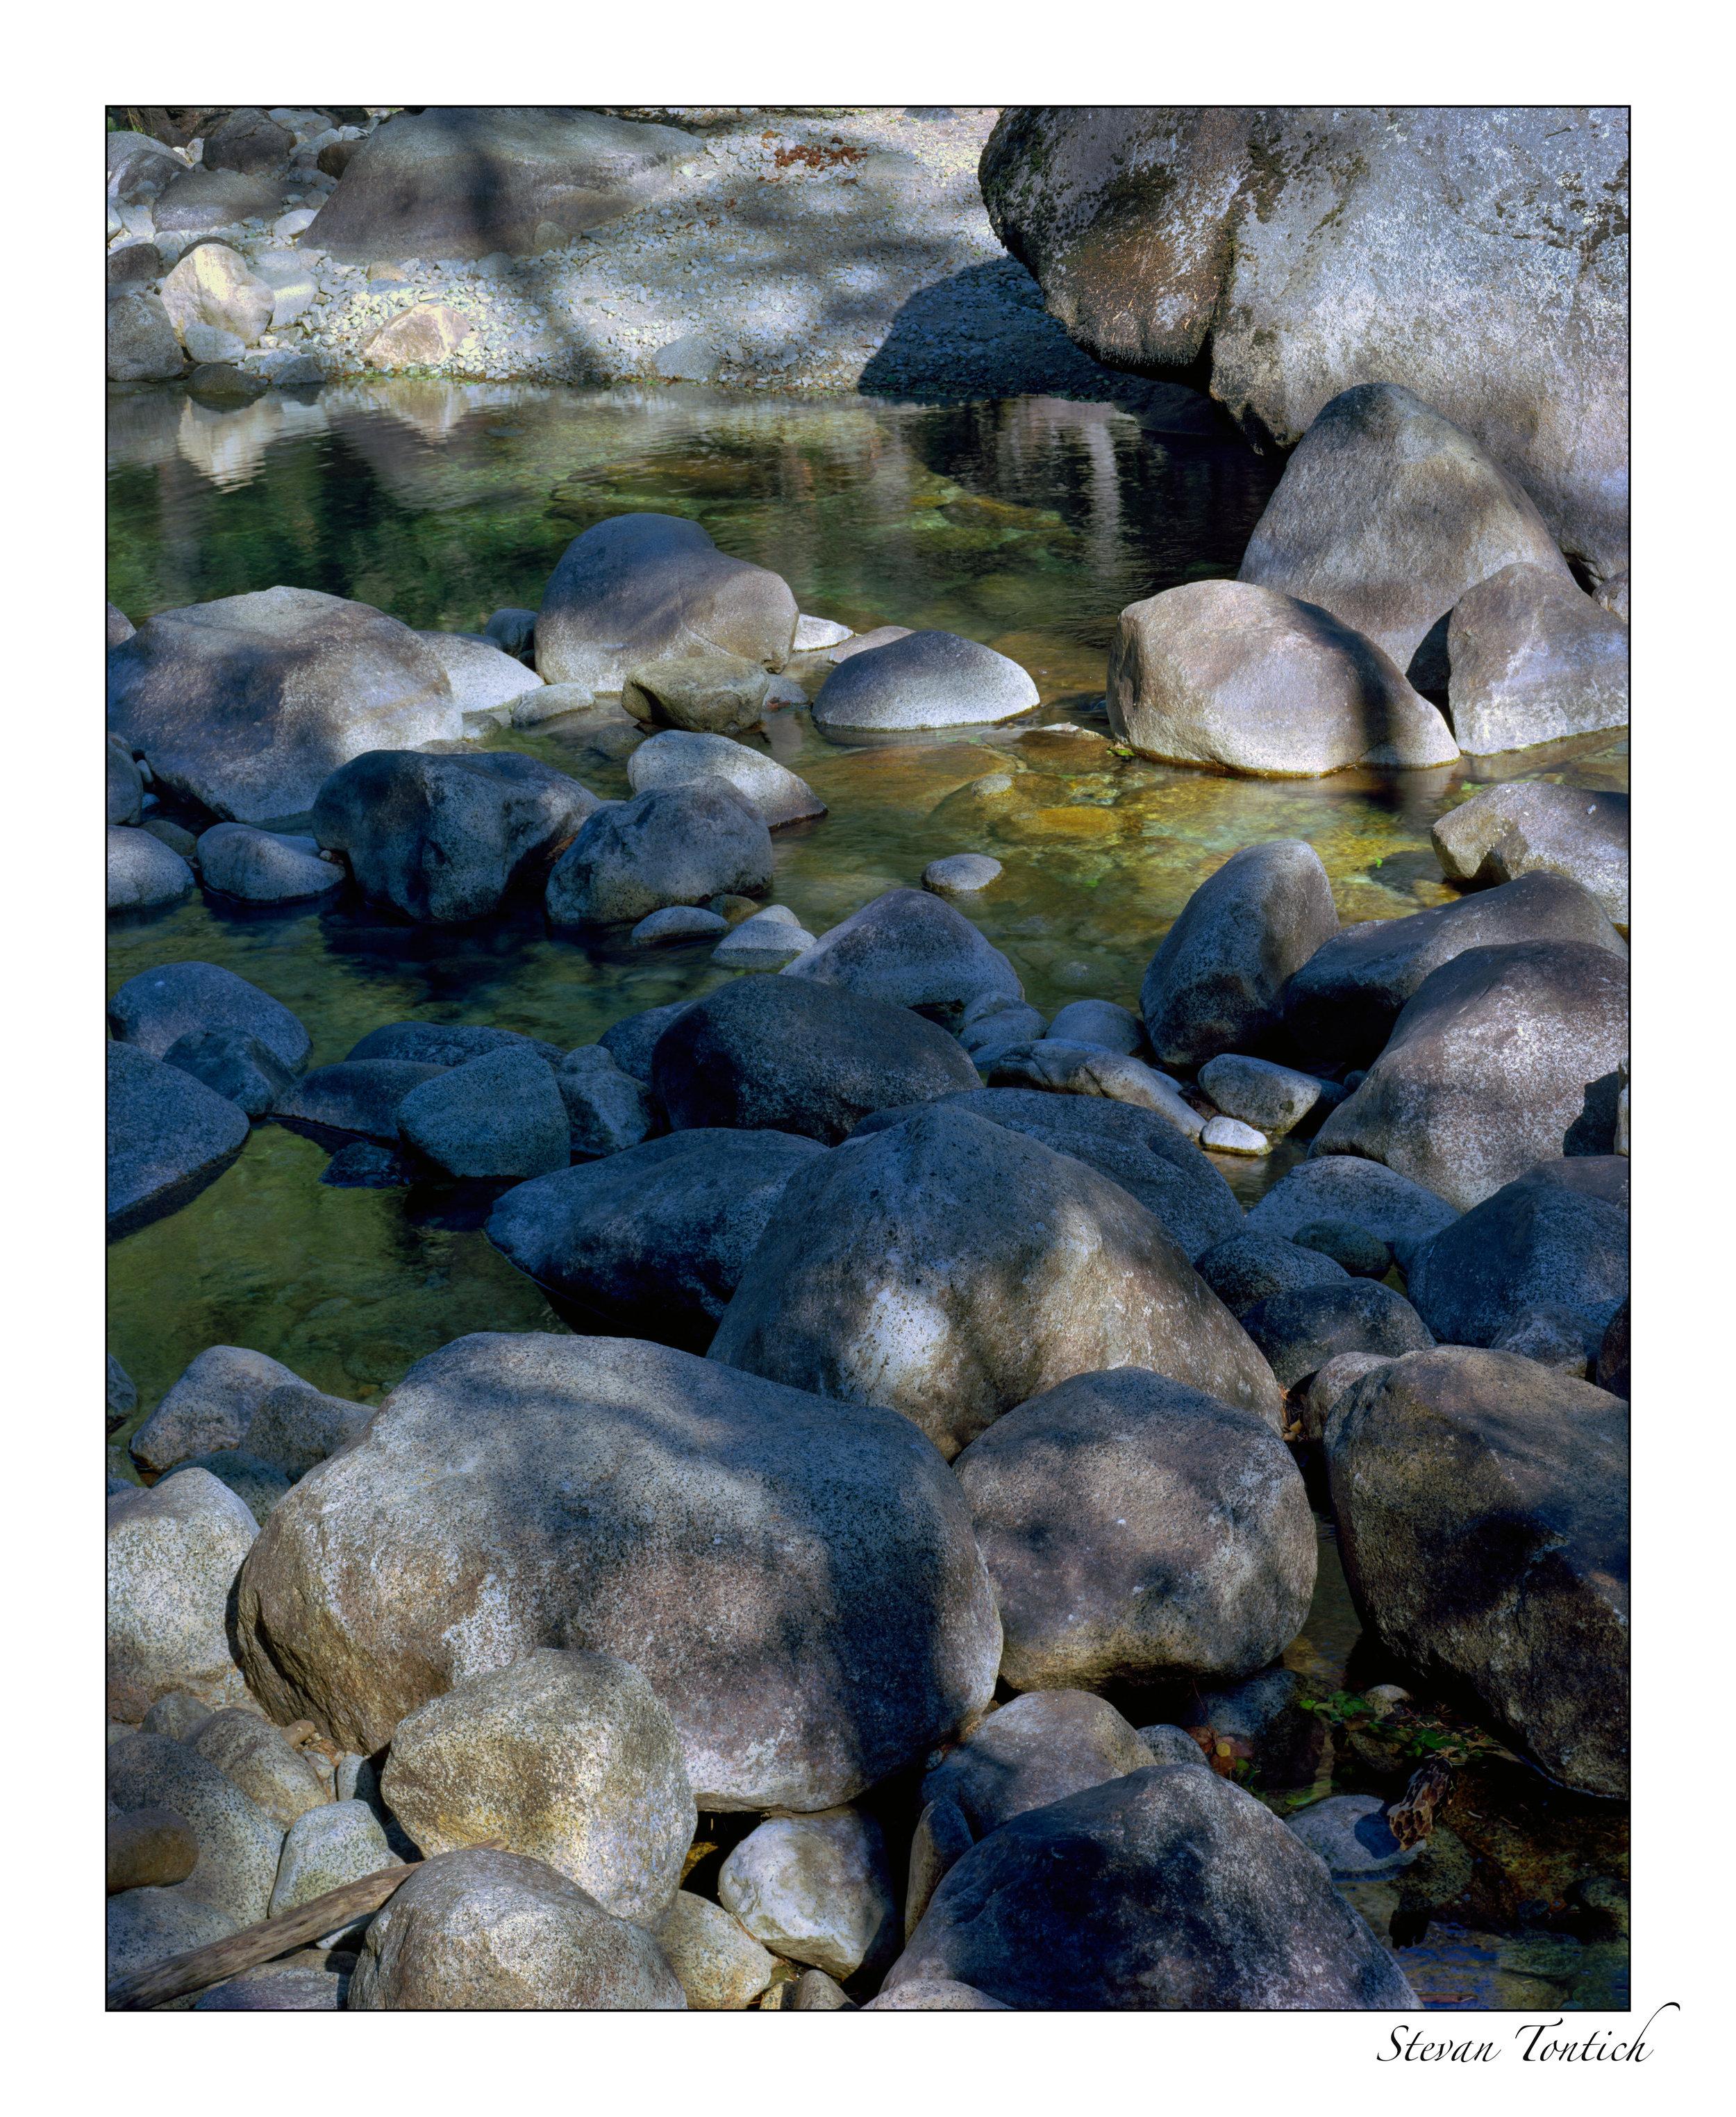 Yosemite cl-0010.jpg